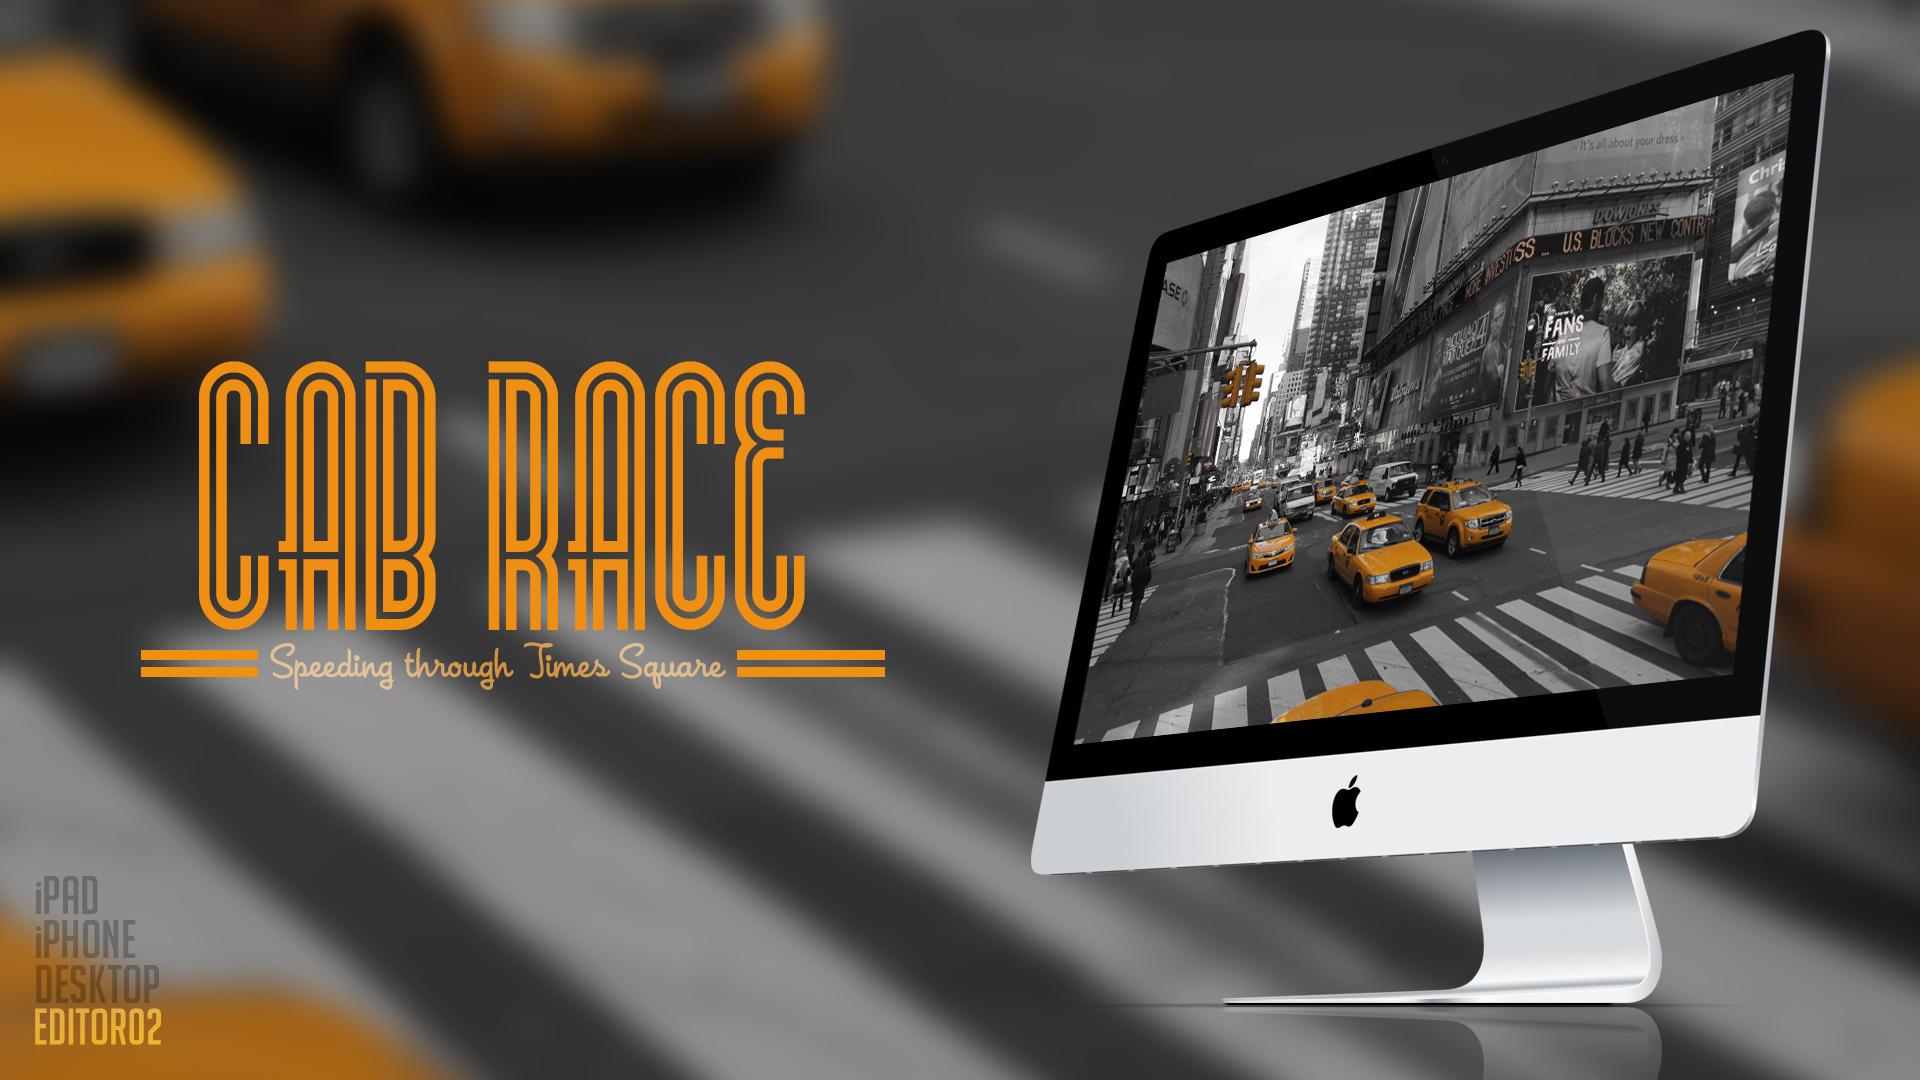 Cab Race - Wallpaper by GavinAsh